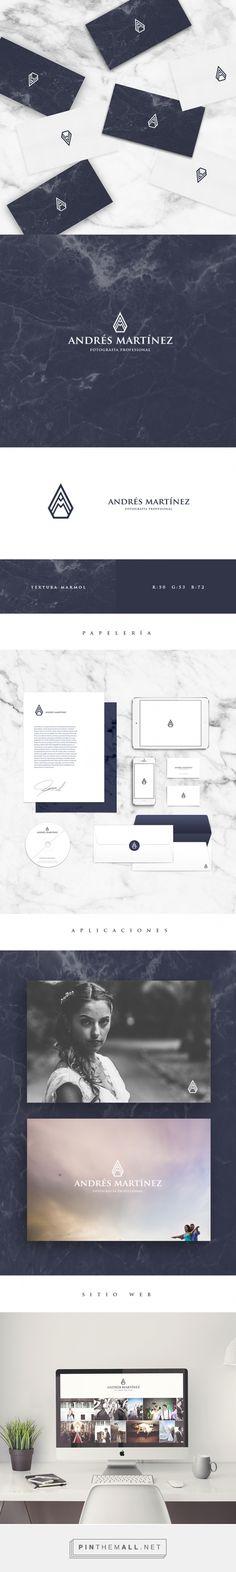 Andrés Martínez Branding on Behance | Fivestar Branding – Design and Branding Agency & Inspiration Gallery